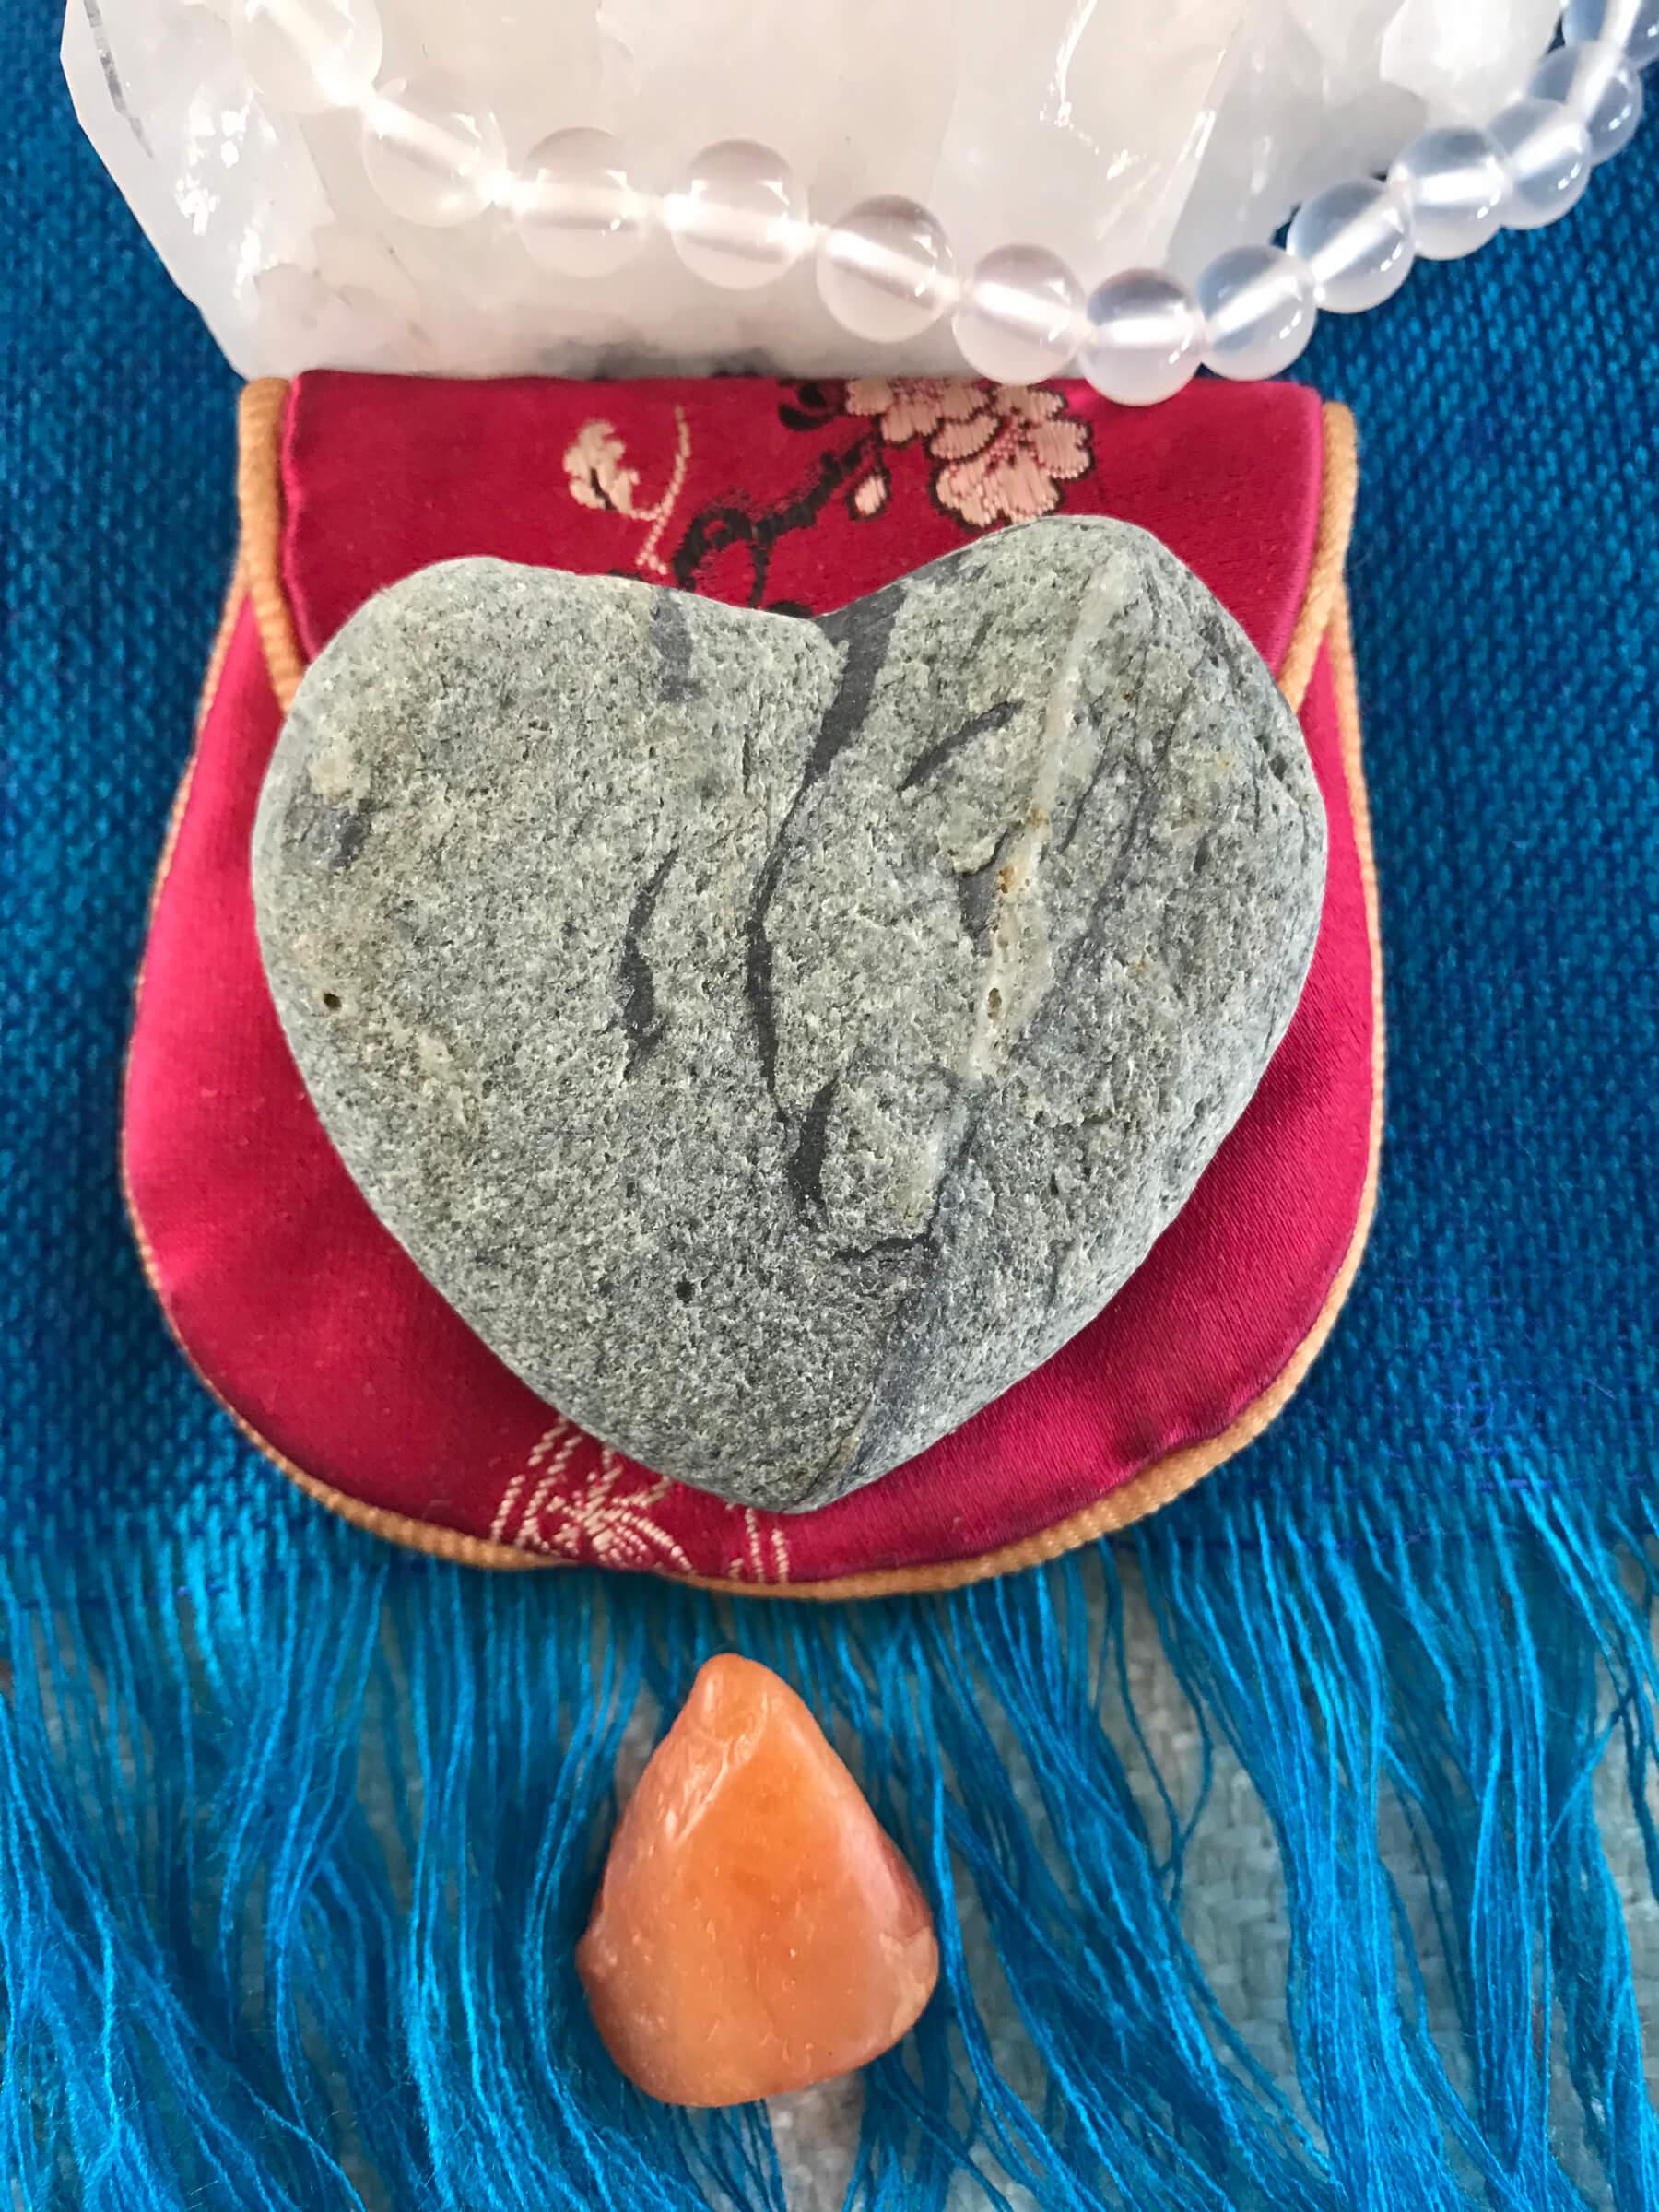 Heart-shaped stone Martha Nicholson found in New Zealand.